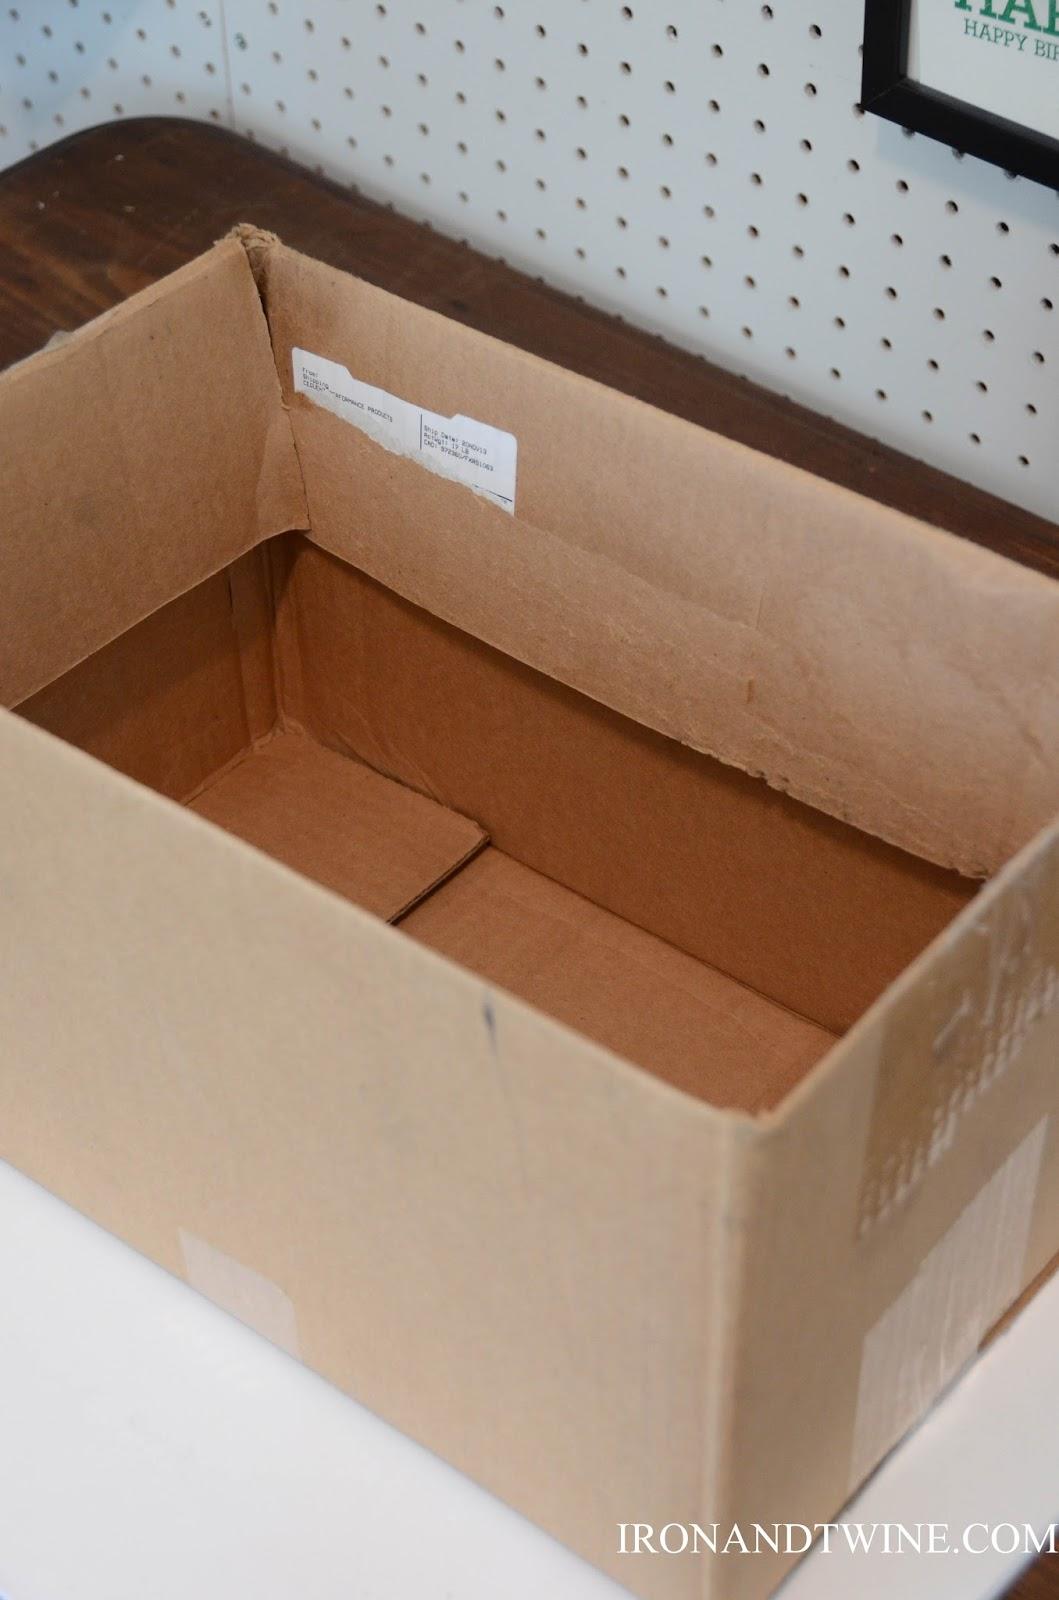 DIY+Belt+Handled+Box,+DIY+fabric+covered+box,+Iron+and+Twine+(12).jpg